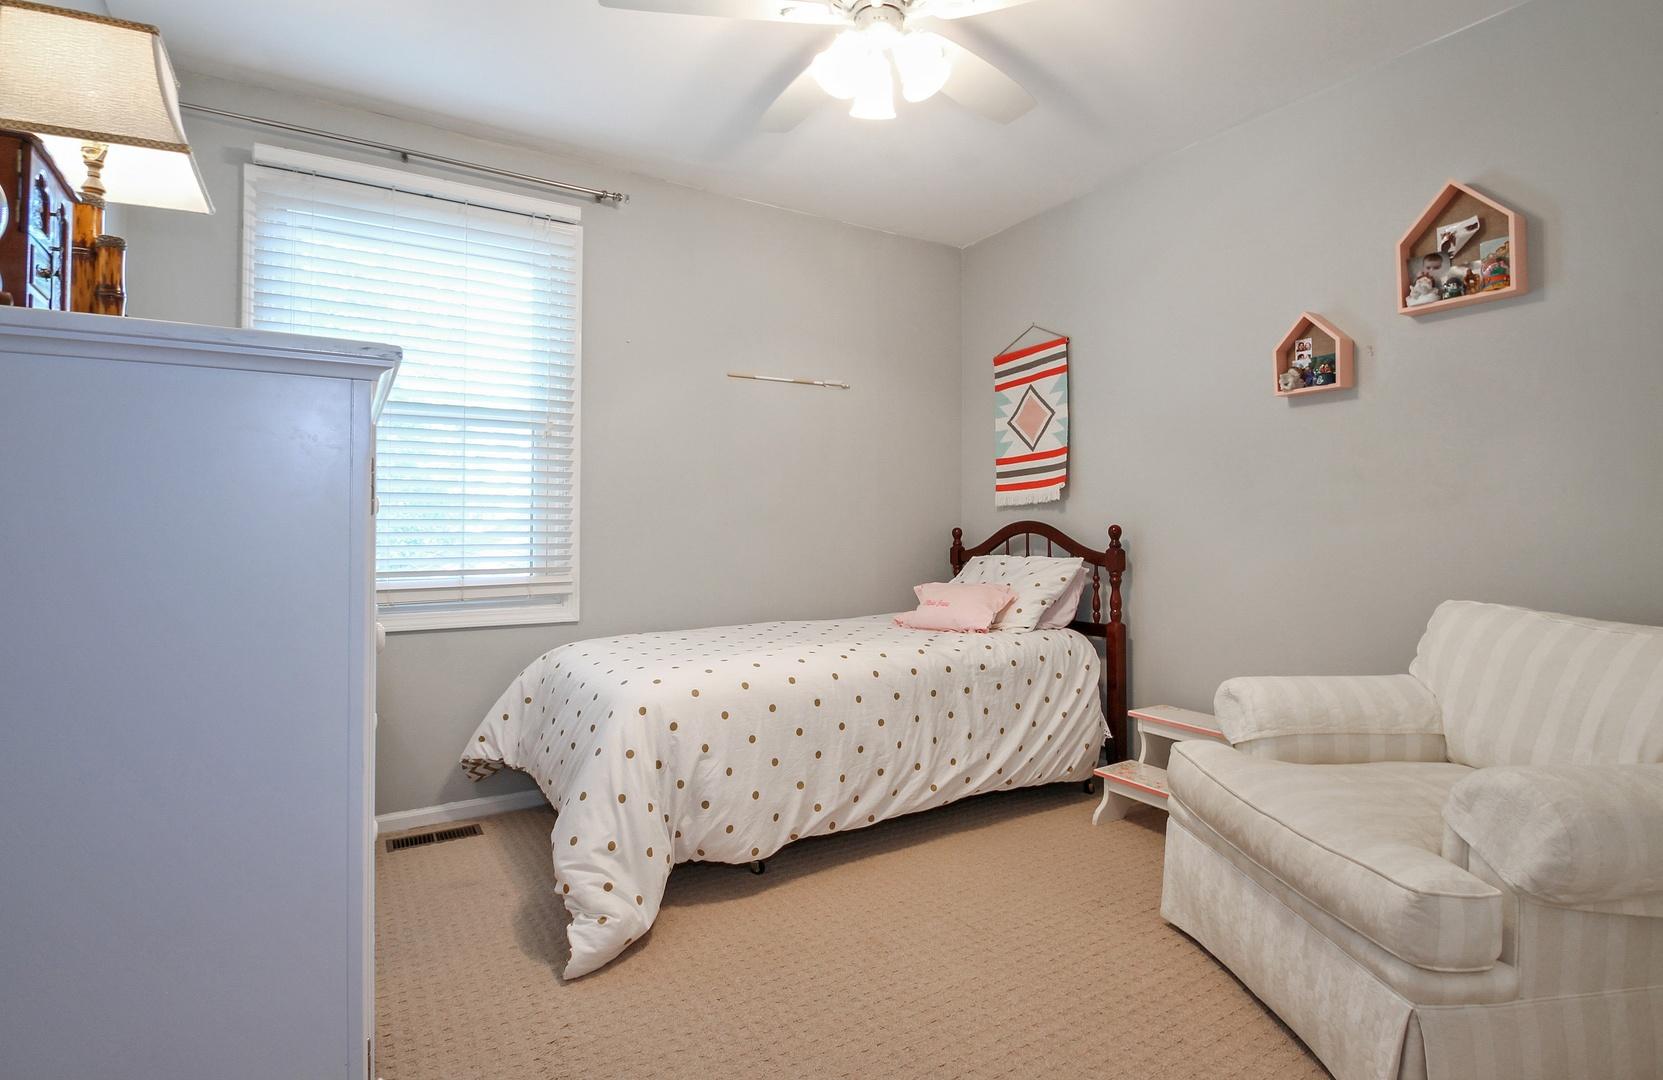 1512 Pebblecreek, Glenview, Illinois, 60025